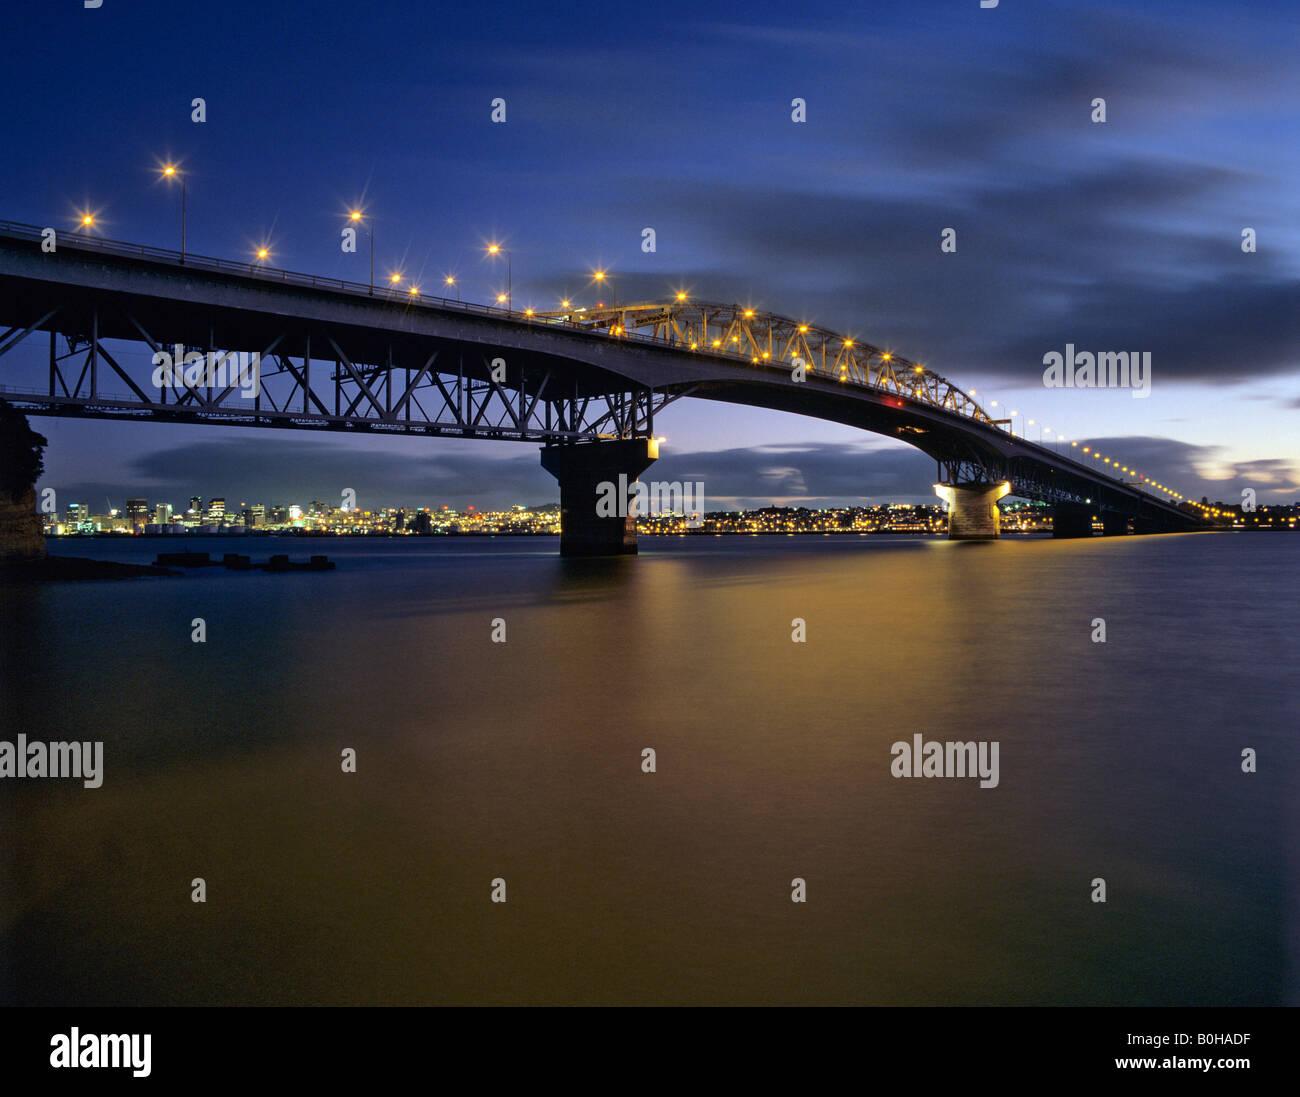 Auckland Harbour Bridge, Waitemata Harbour, Saint Mary's Bay, Auckland, New Zealand - Stock Image